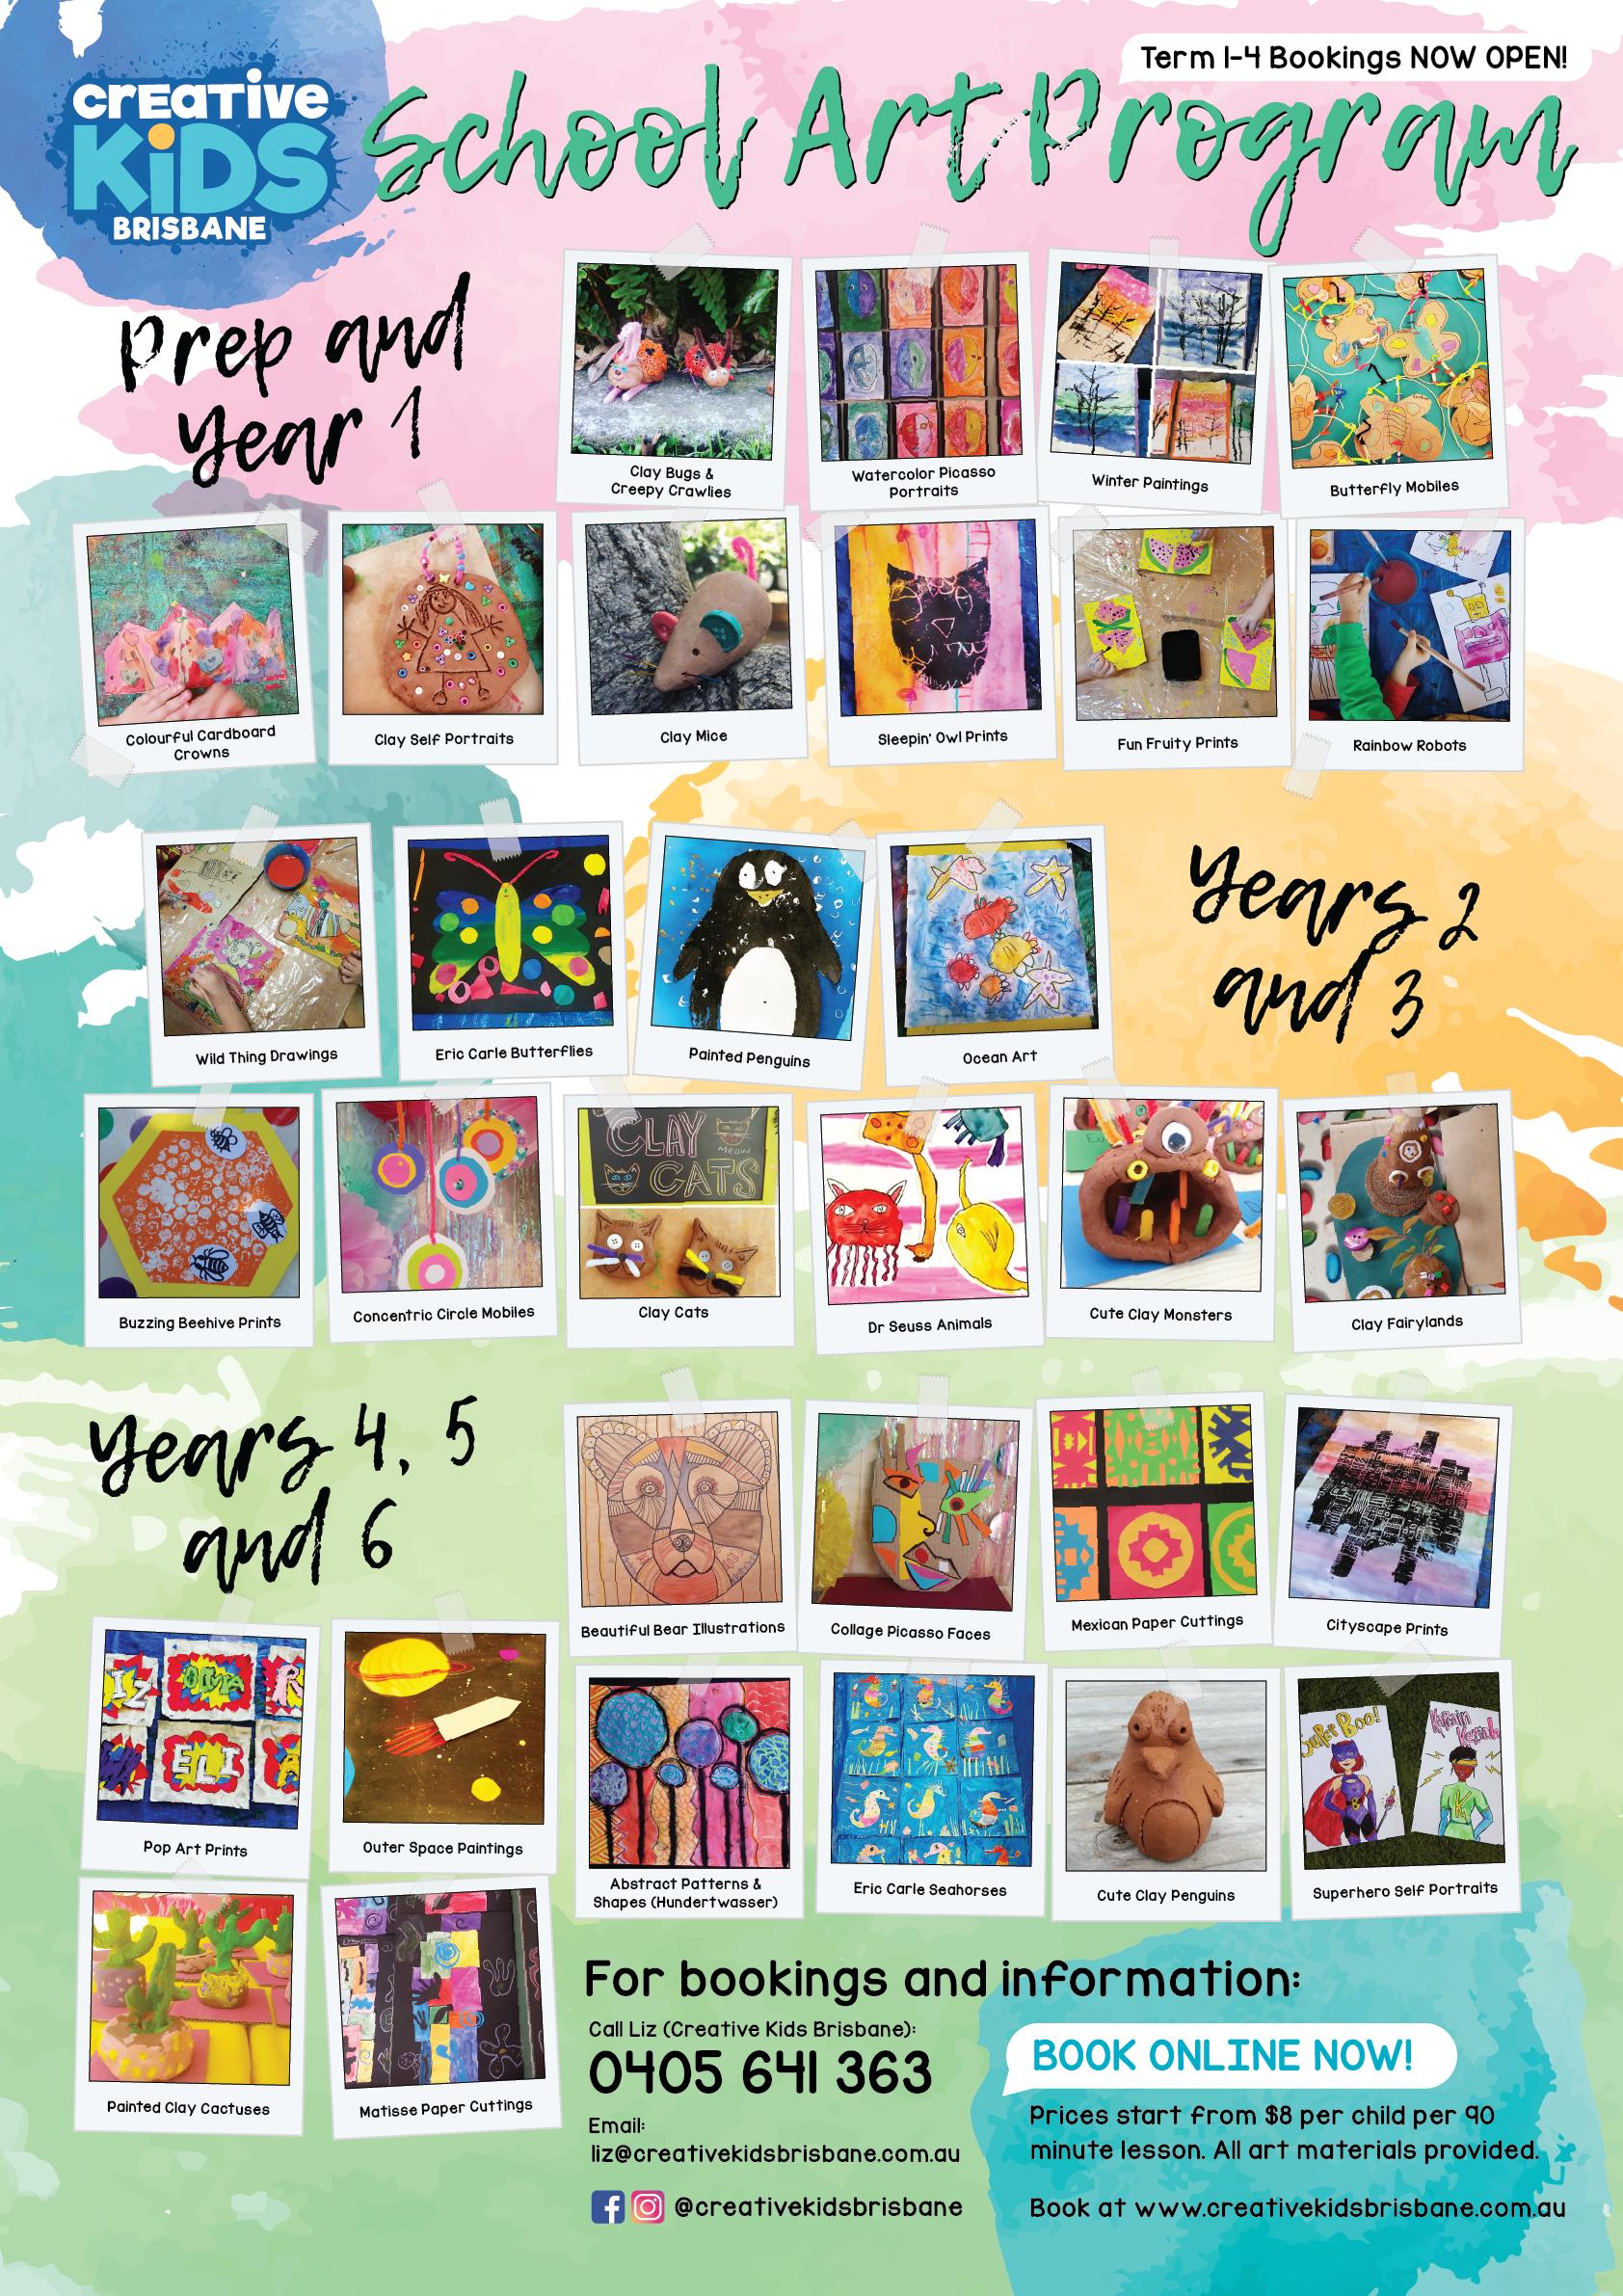 CKids School Art Program.png